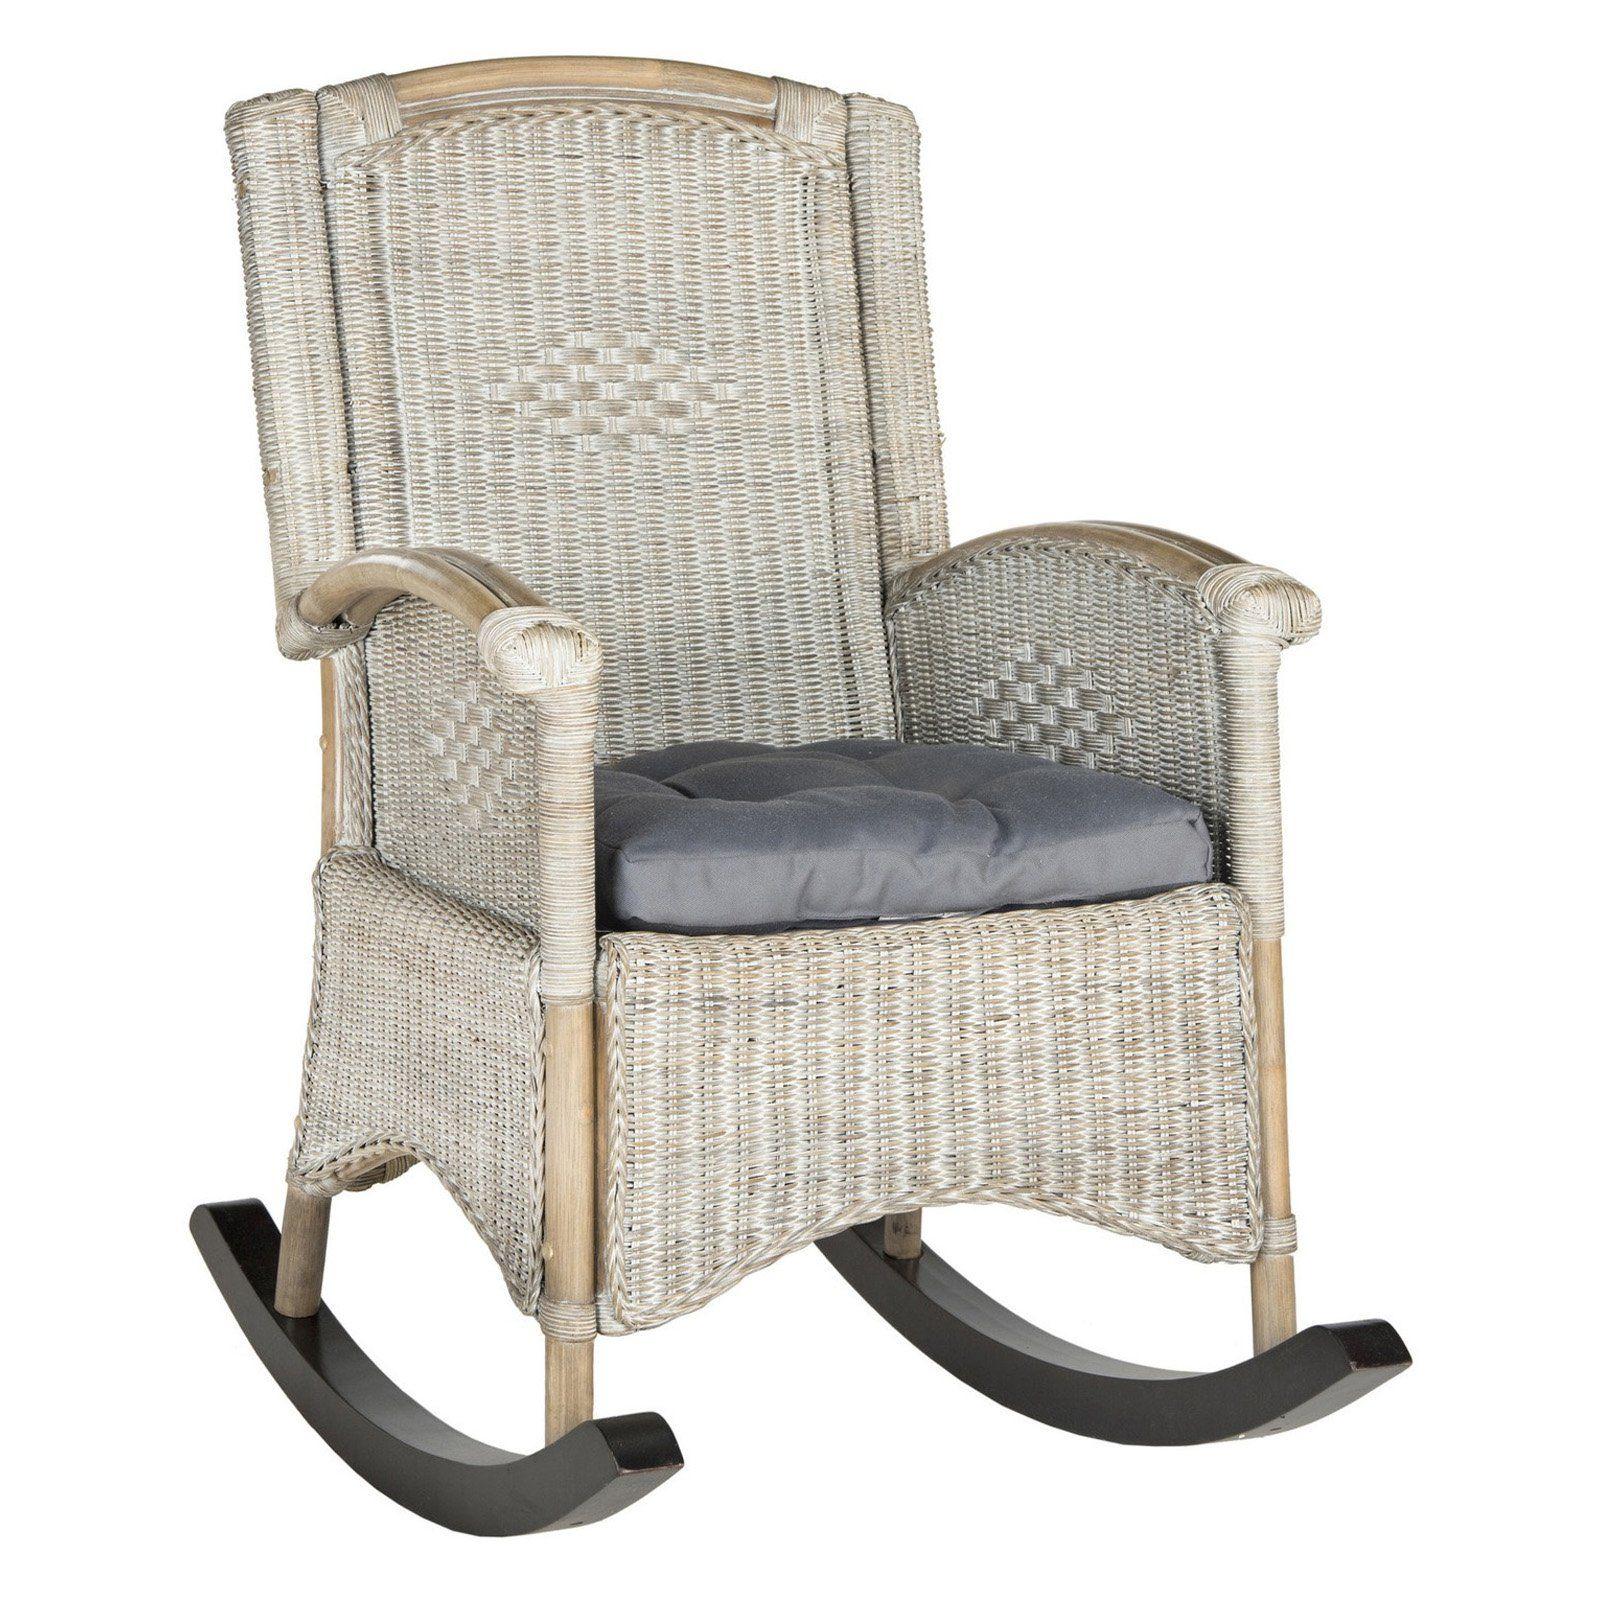 Safavieh Verona Wicker Outdoor Rocking Chair Rattan